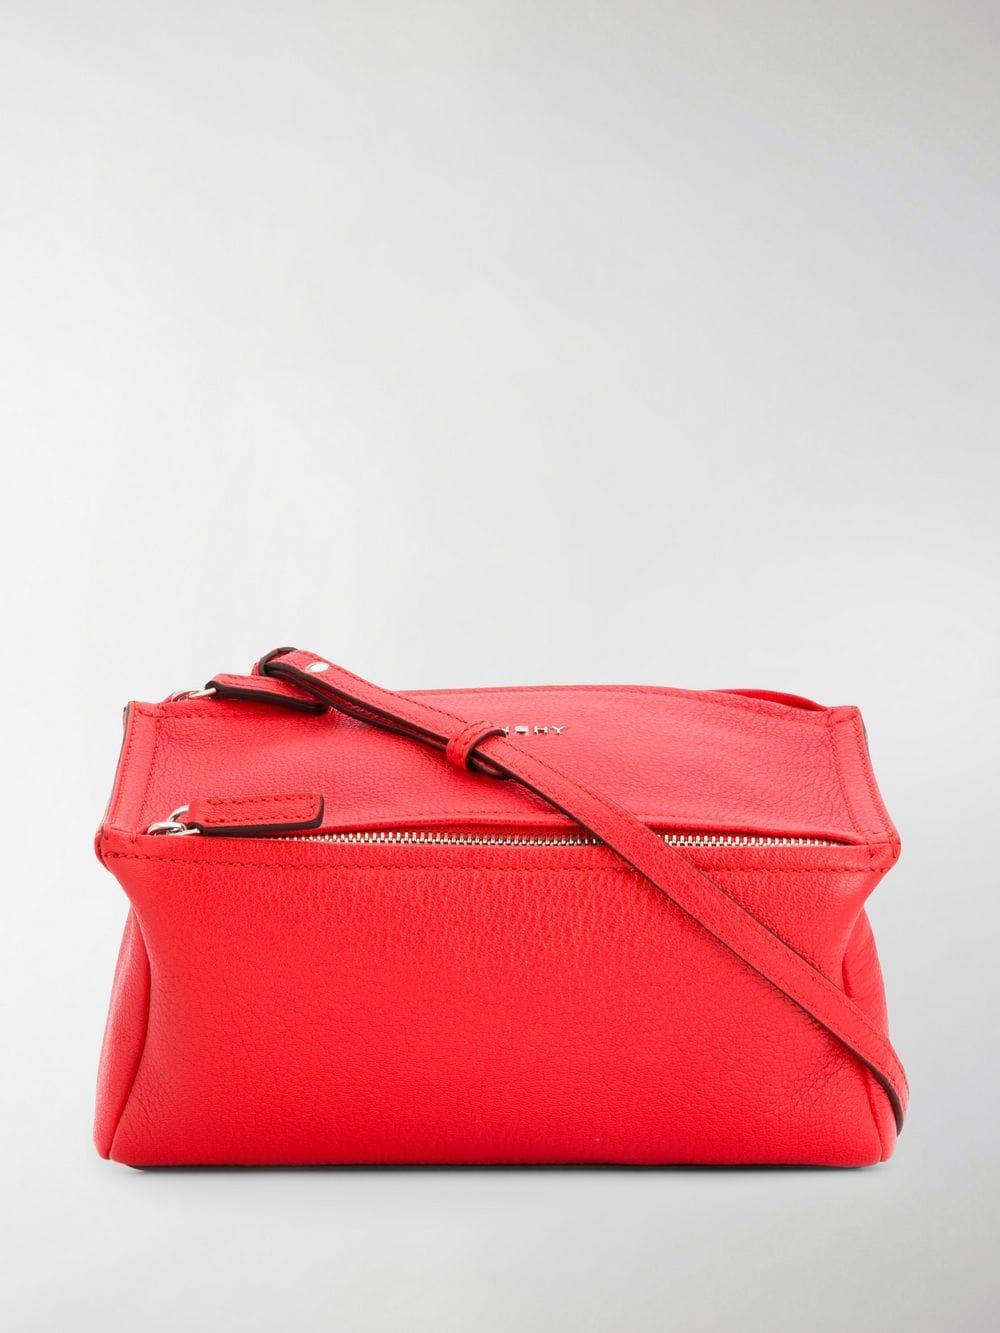 f65a9728876c Givenchy Mini Pandora Crossbody Bag in Red - Lyst